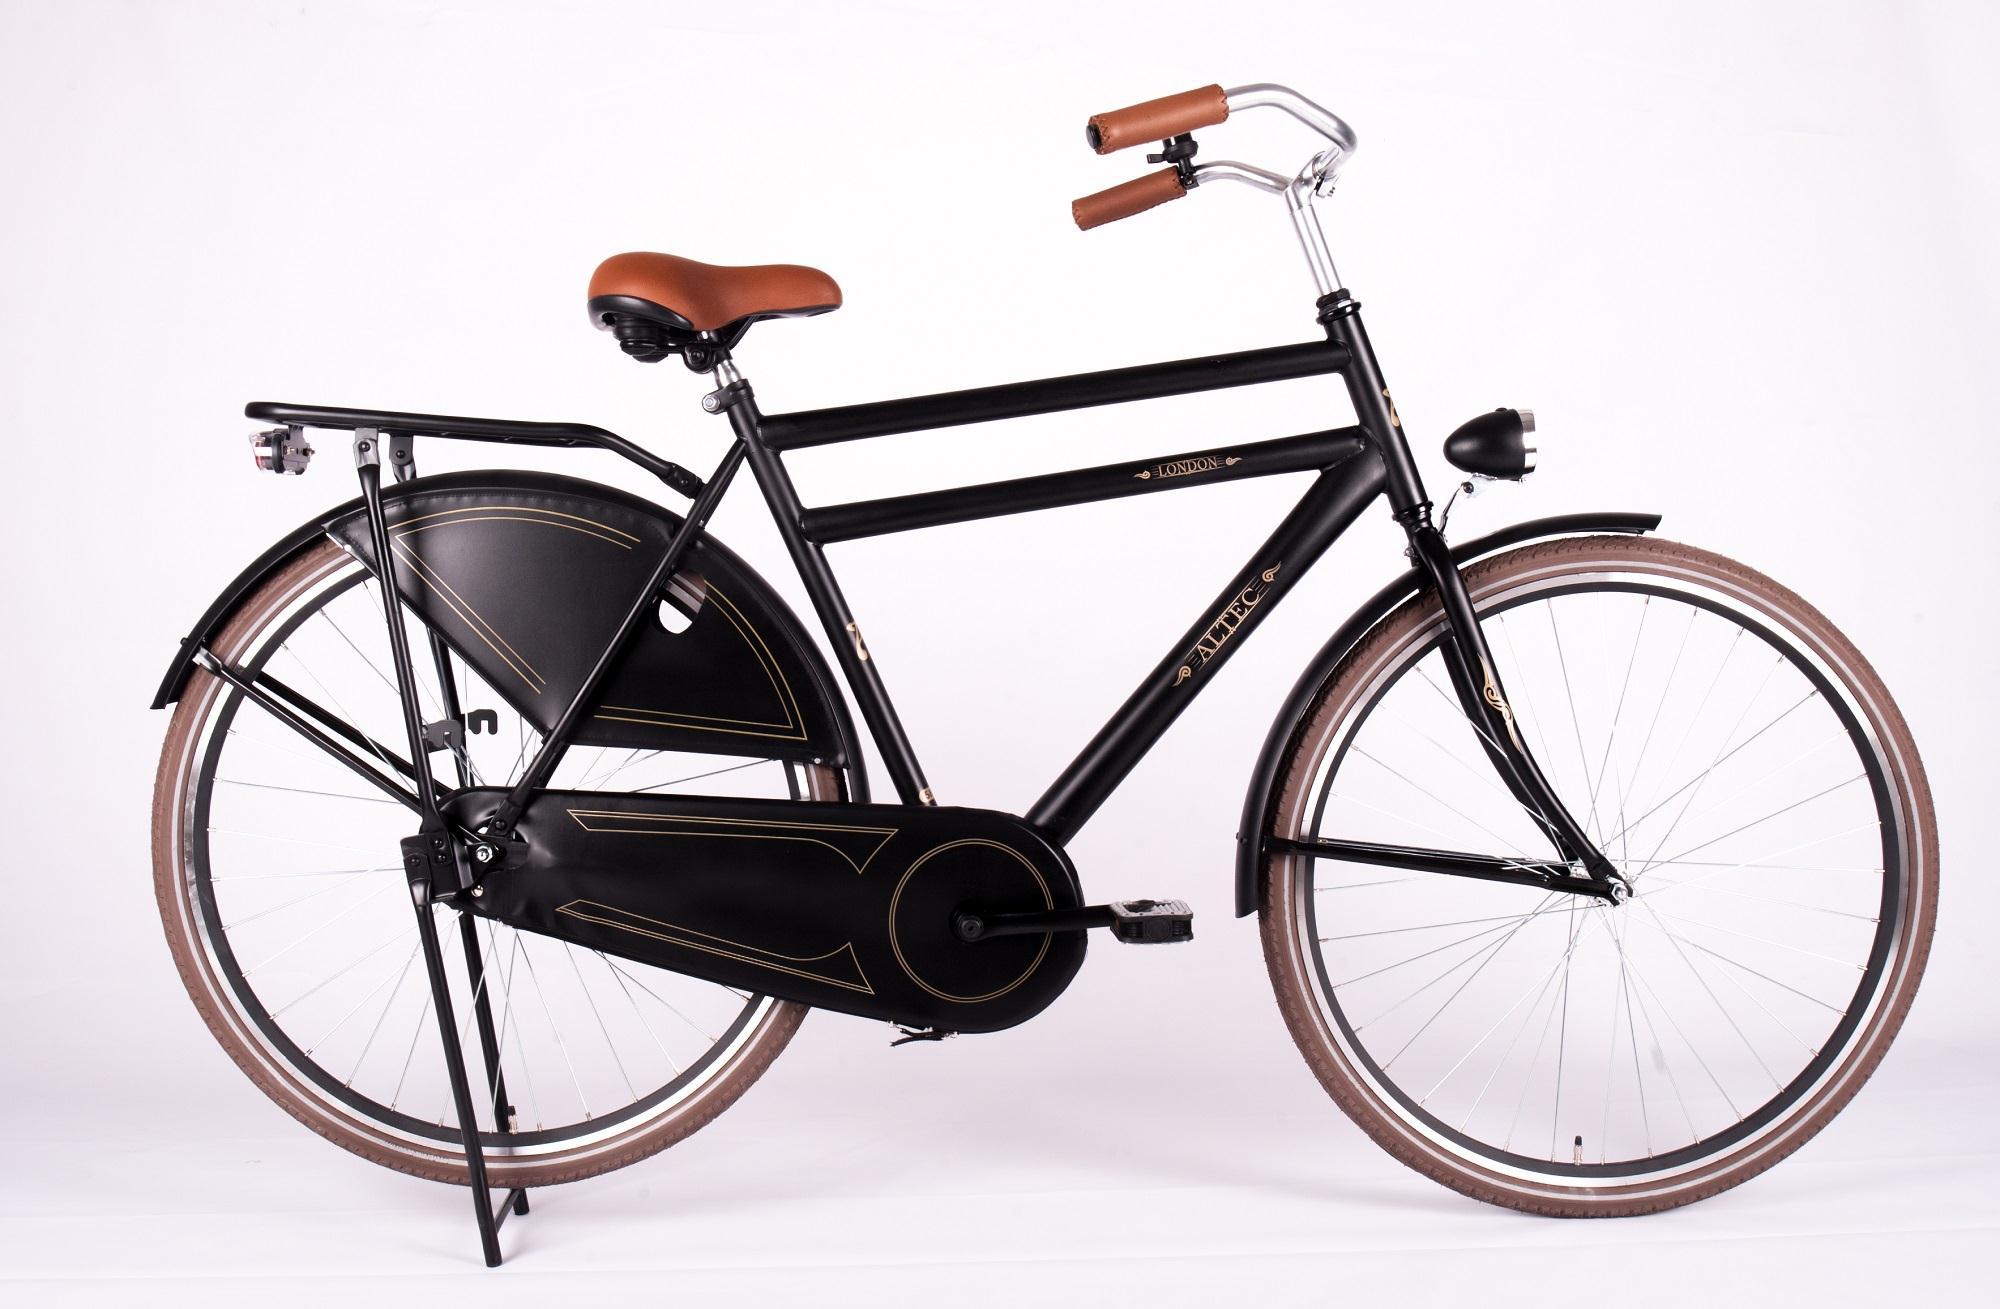 hamburg das hollandrad kultiges fahrrad f r stadt und land. Black Bedroom Furniture Sets. Home Design Ideas